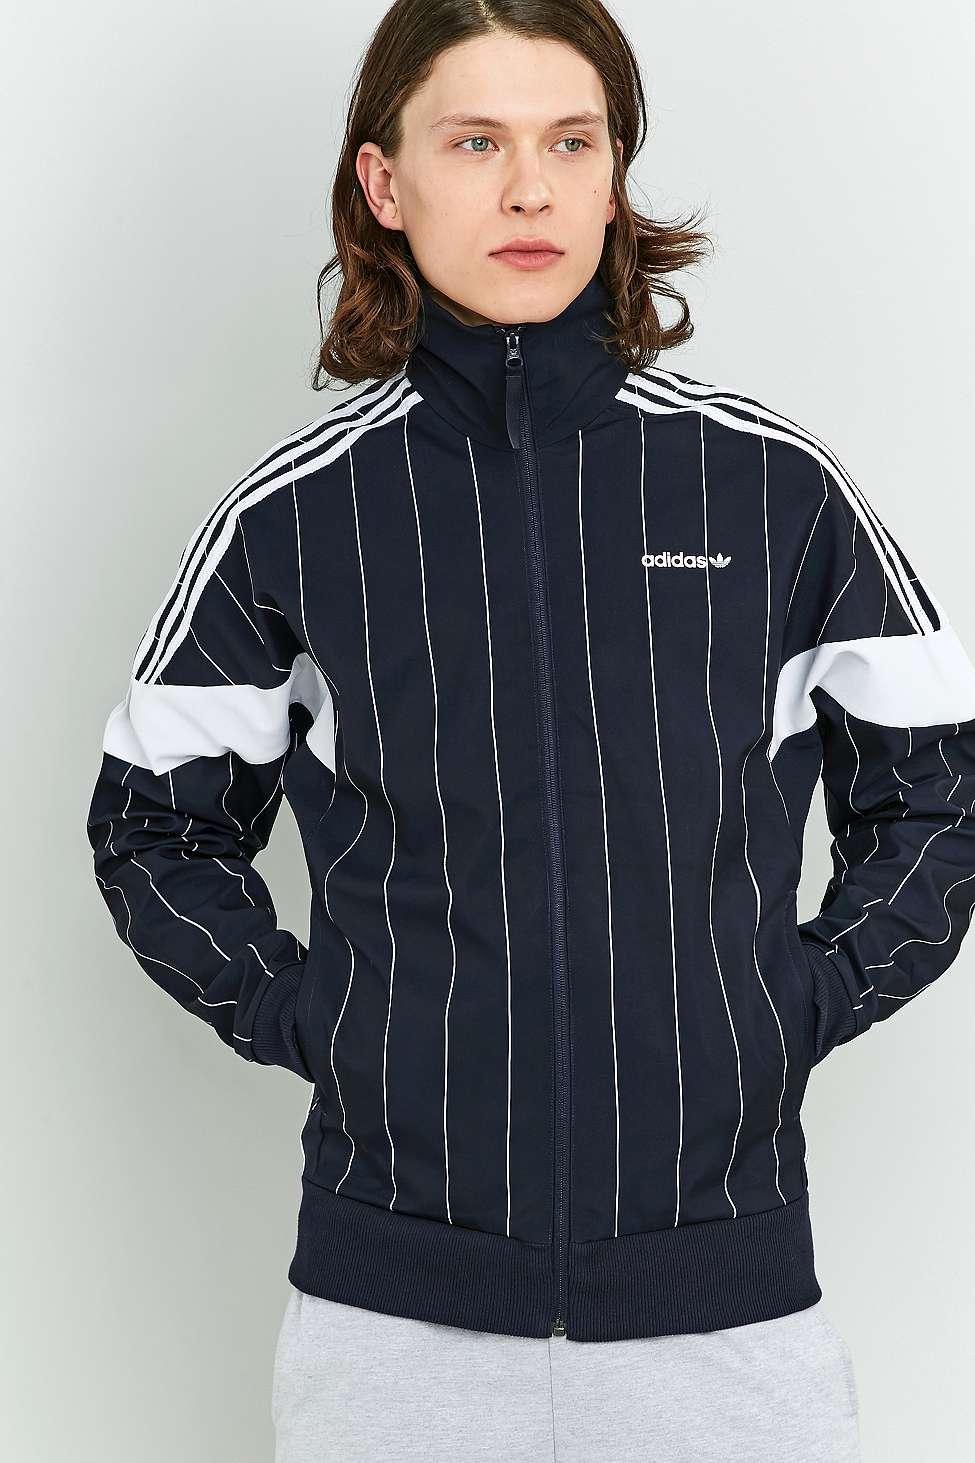 adidas originali tokyo gessato challenger track top in blu